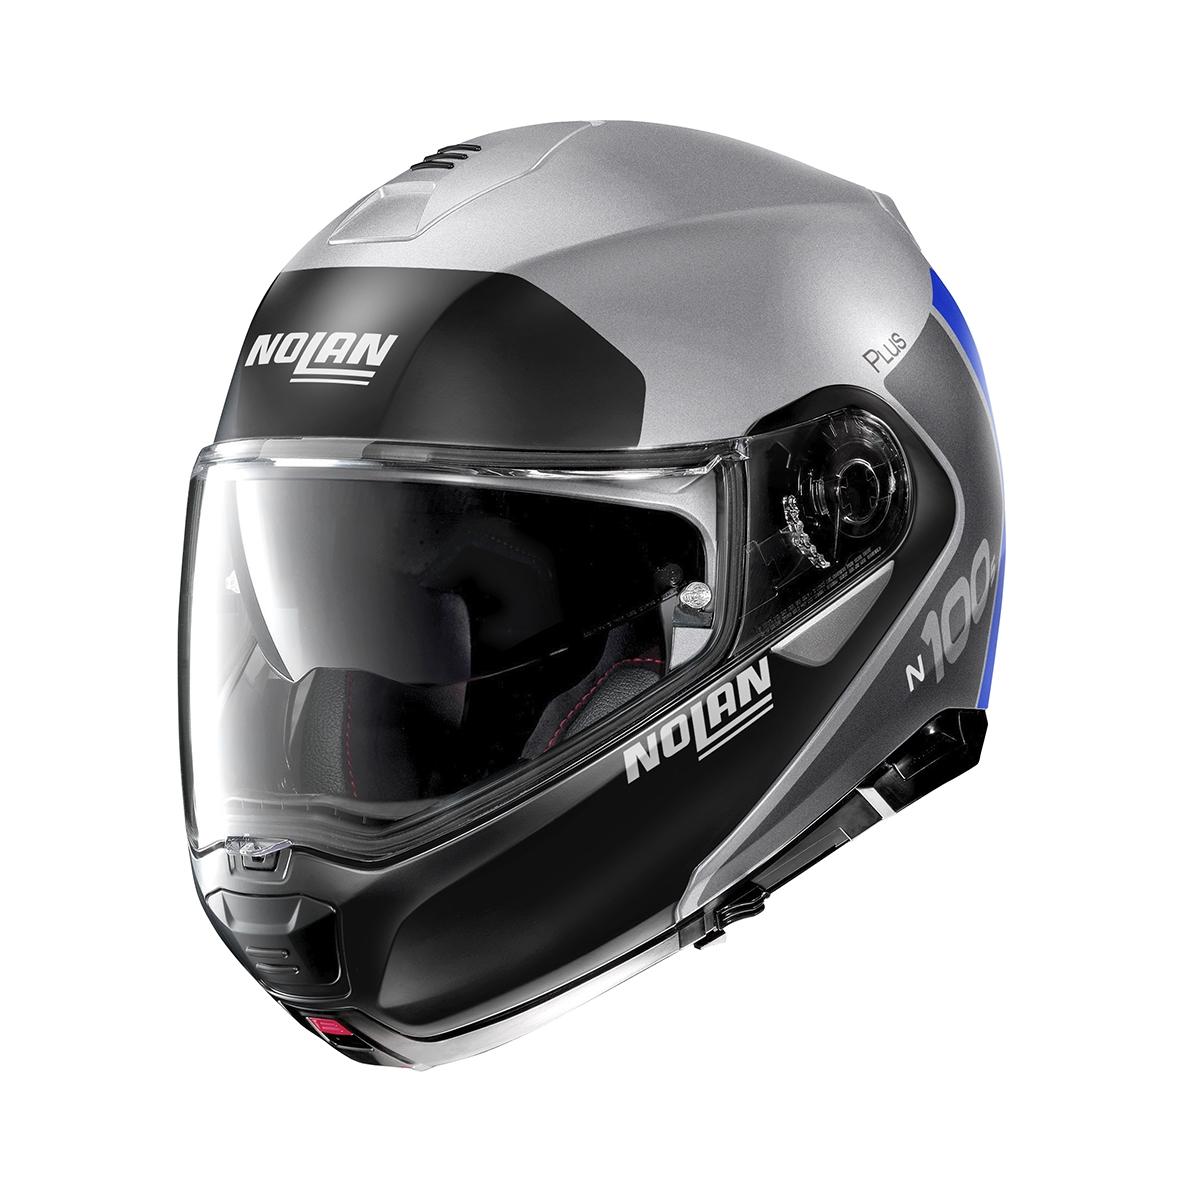 Moto helma Nolan N100-5 Plus Distinctive N-Com Flat Silver 30